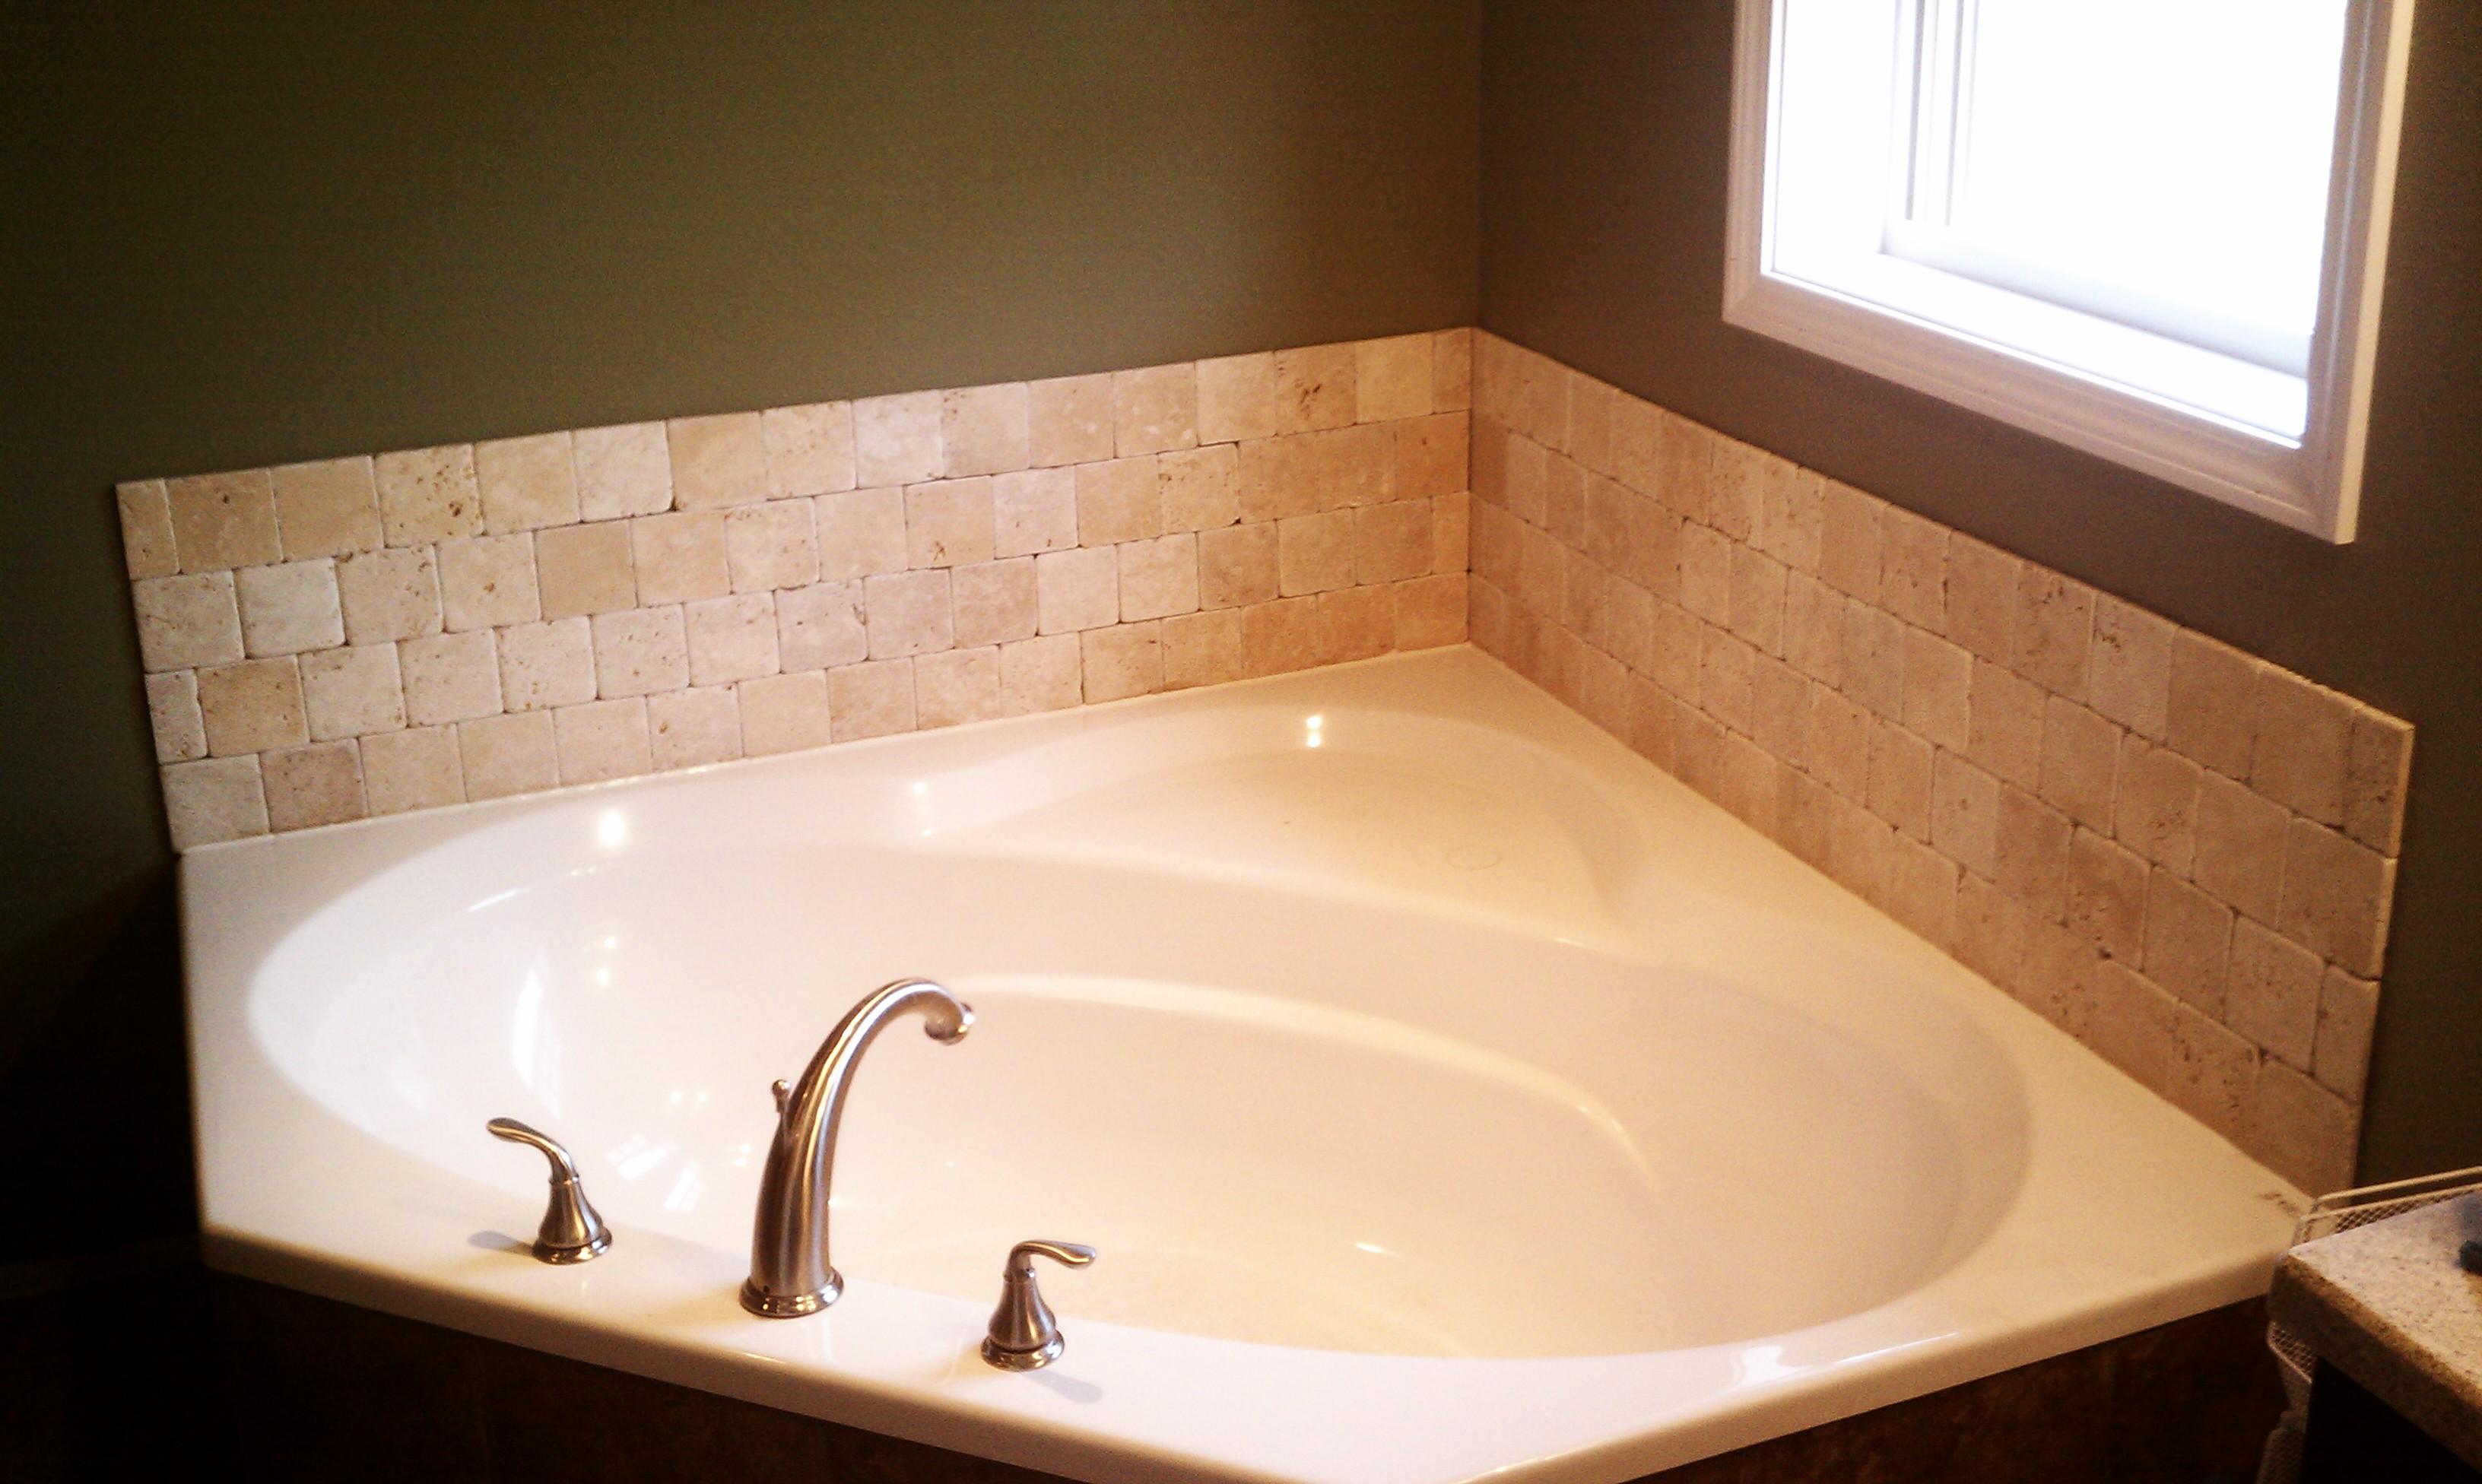 Tile Bath Surround - Ullom Construction & Snow Removal - Storm Lake ...